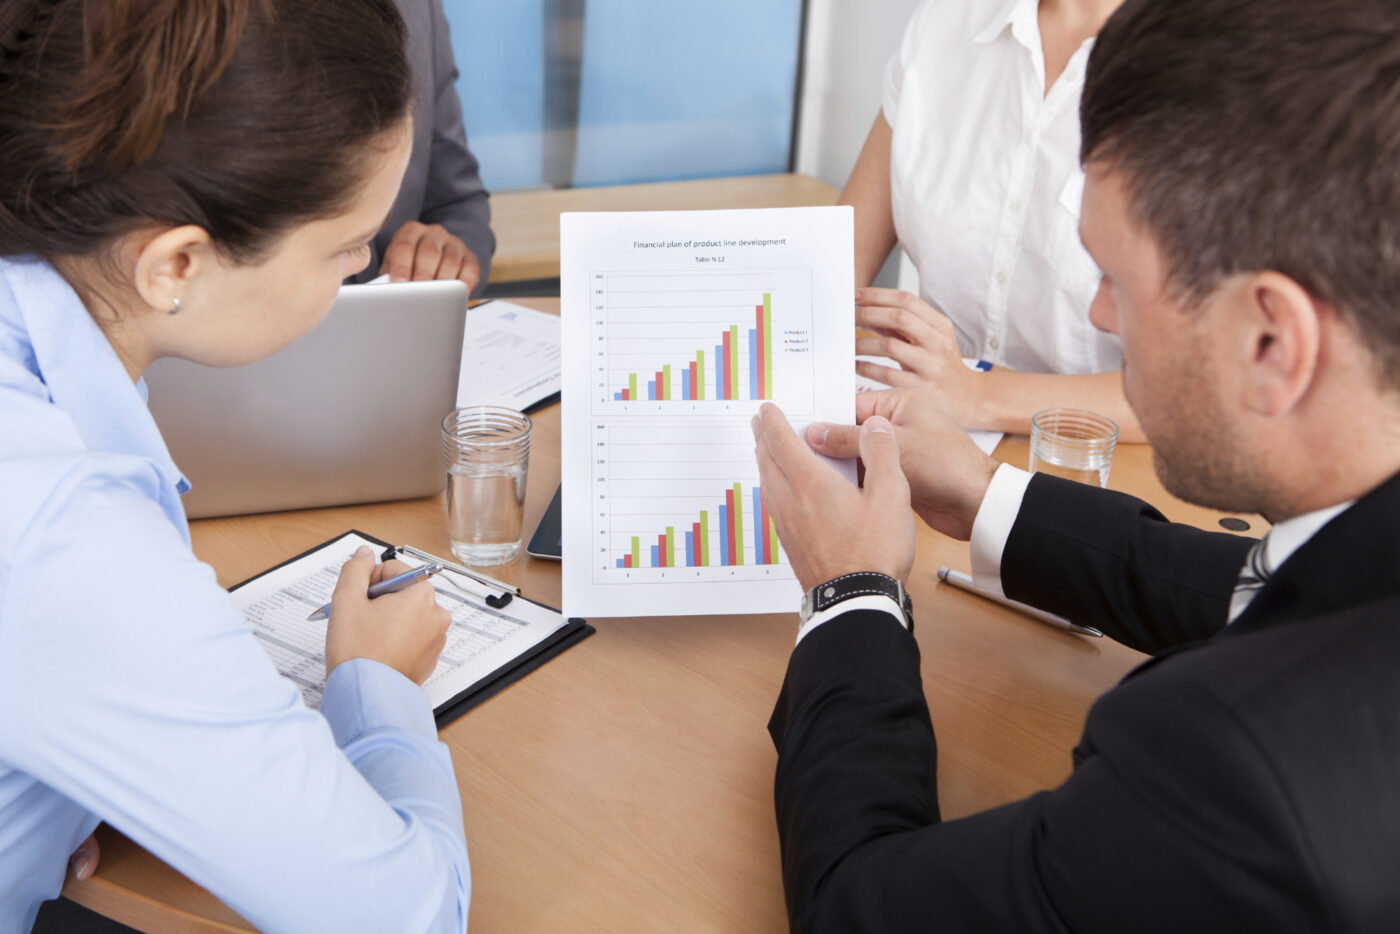 Transitioning to Alternative Payment Methodologies